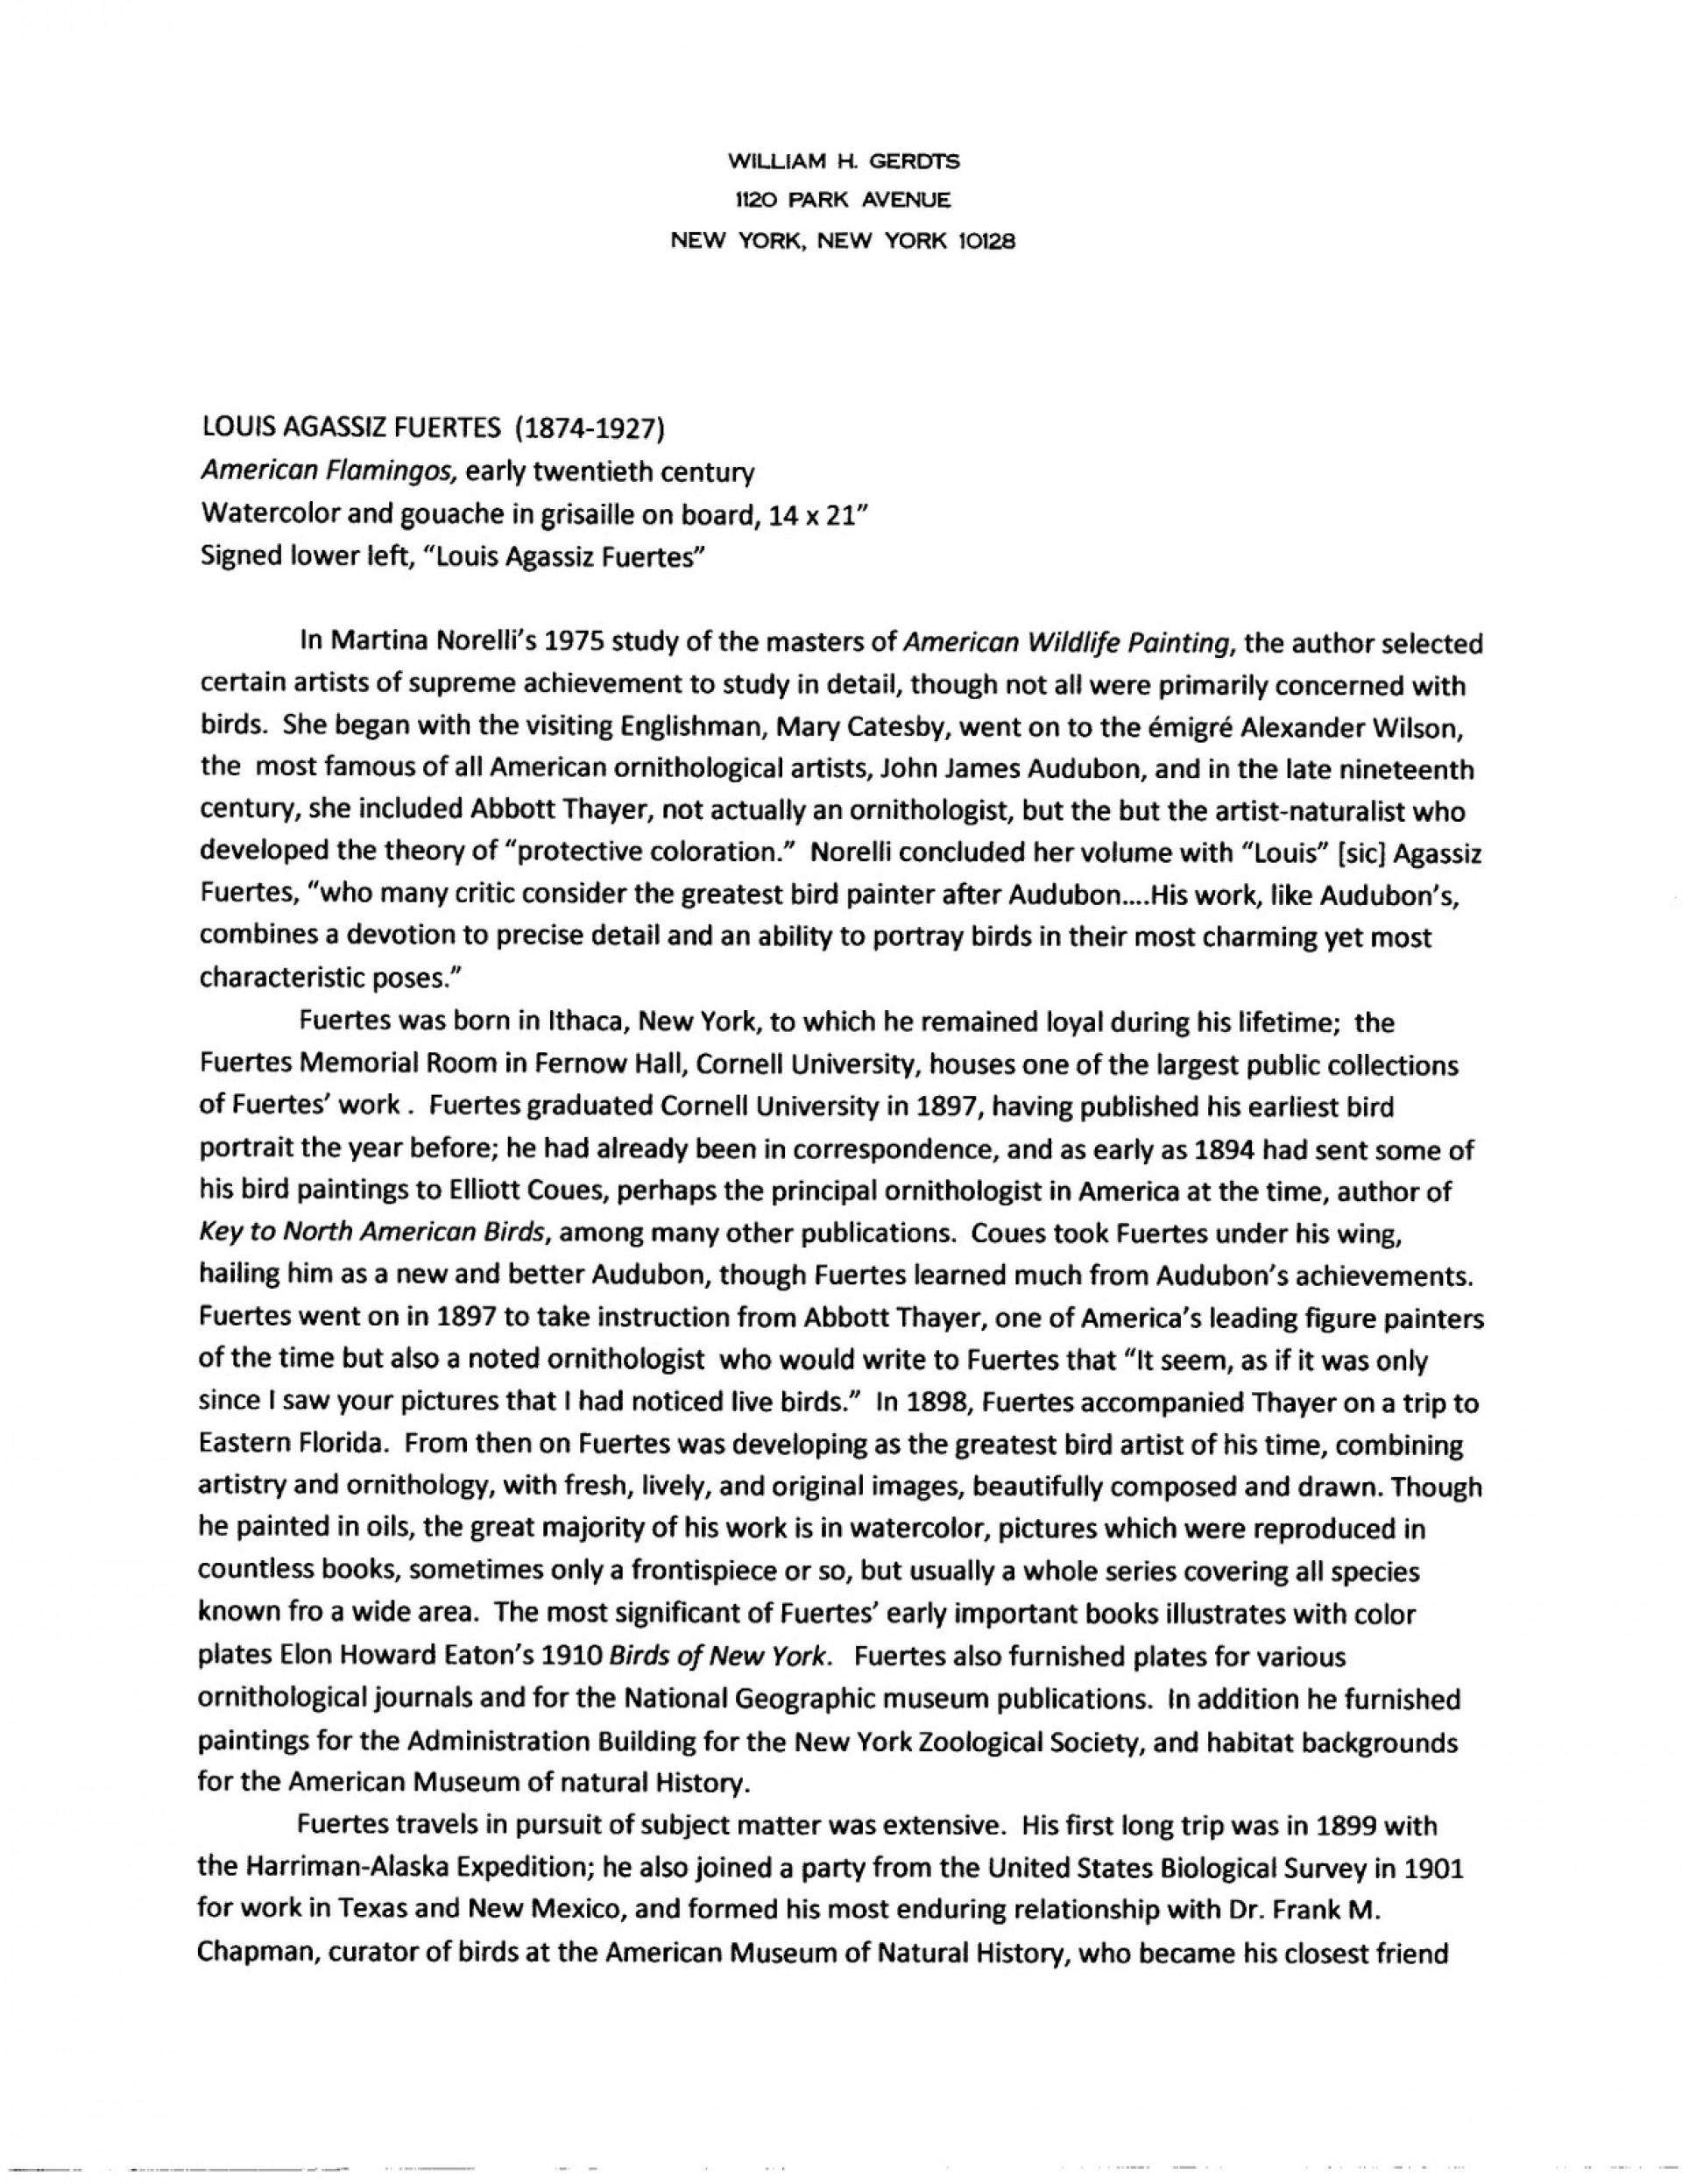 001 Essay Example Fuertes20american20flamingos20001 Graduate Fantastic School Examples Education Header Grad Sample Psychology 1920